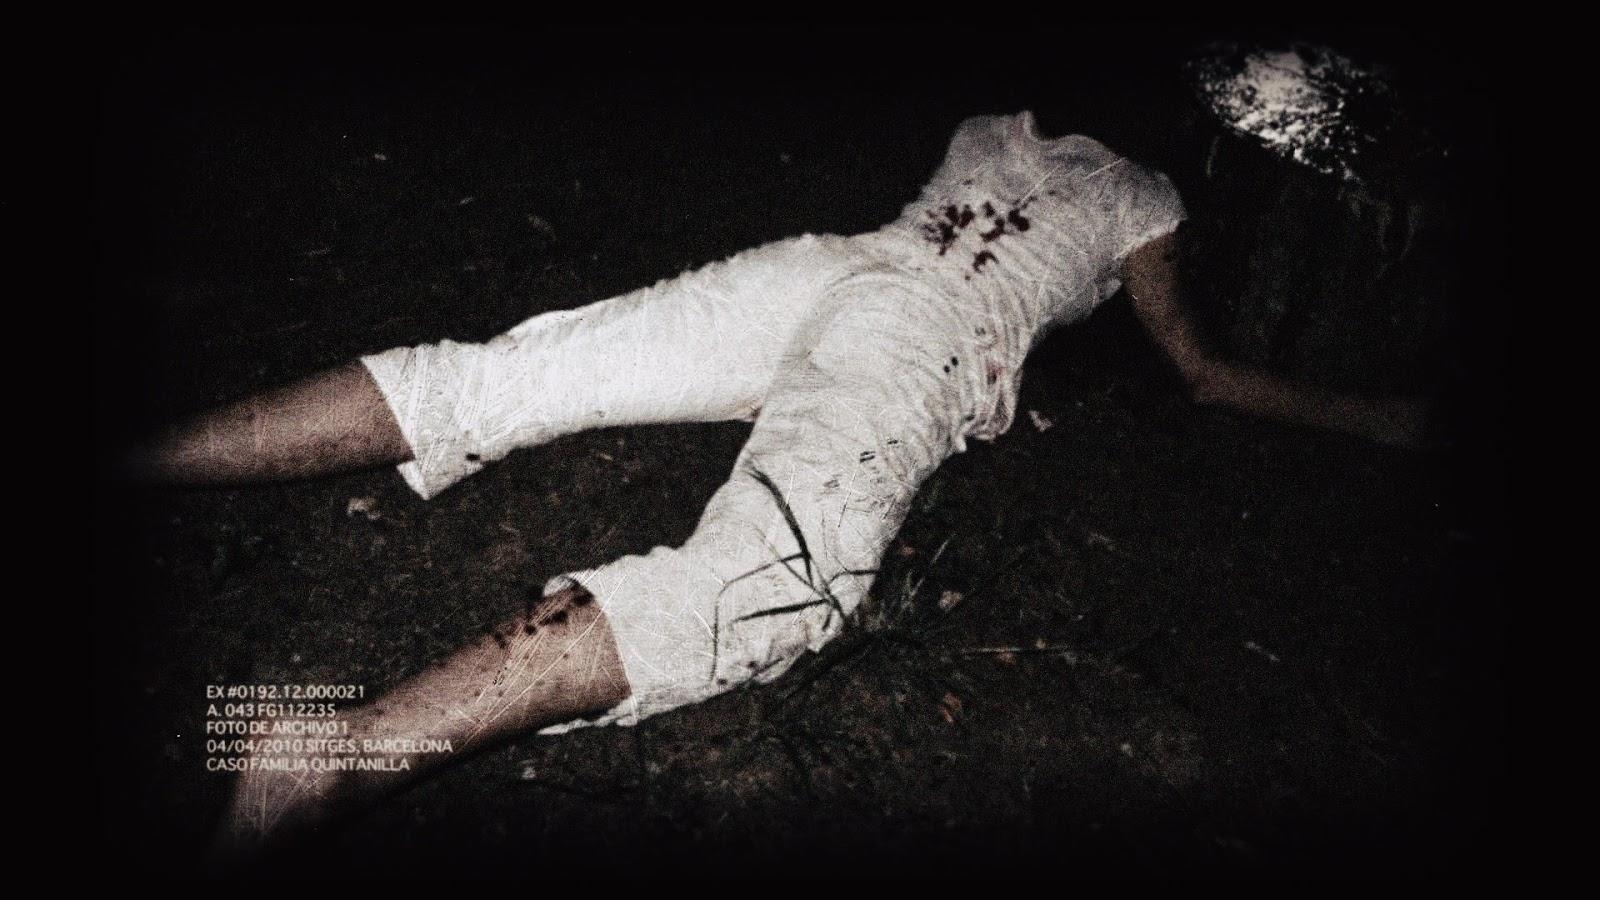 Atrocious: Terror Paranormal (2010) 1080P BDREMUX